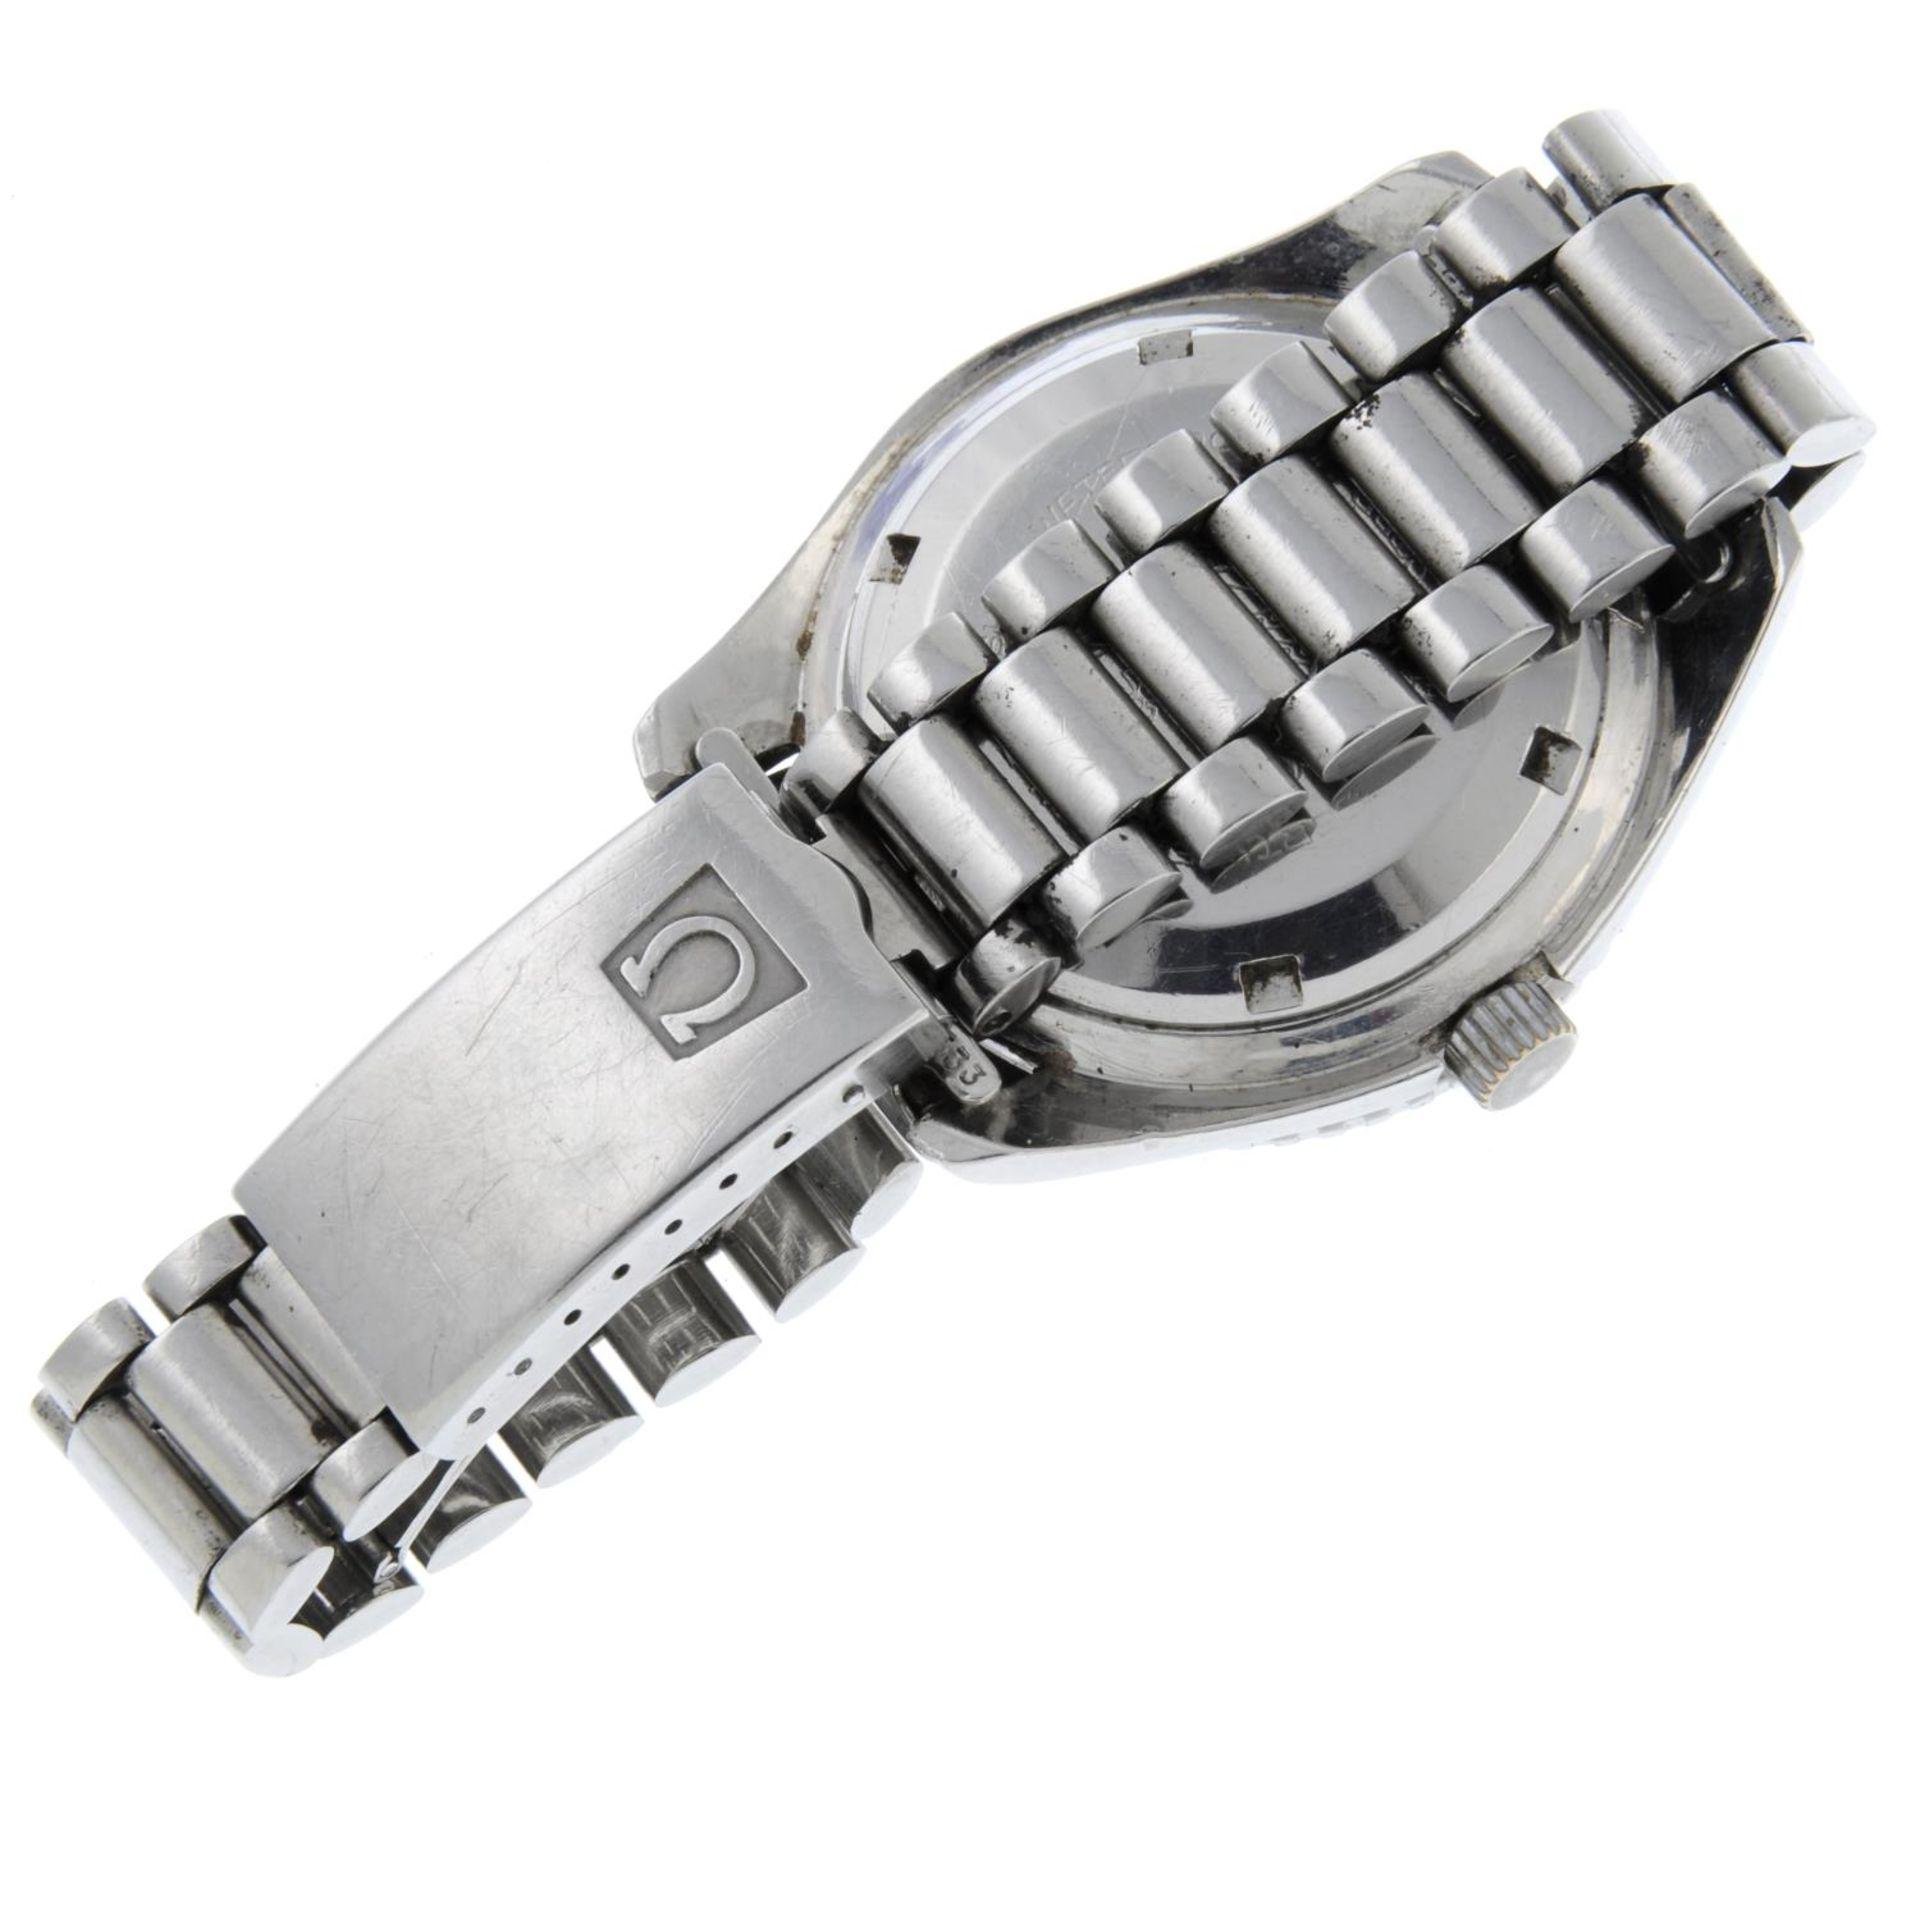 OMEGA - a Seamaster 300 'Big Triangle' bracelet watch. - Bild 2 aus 4